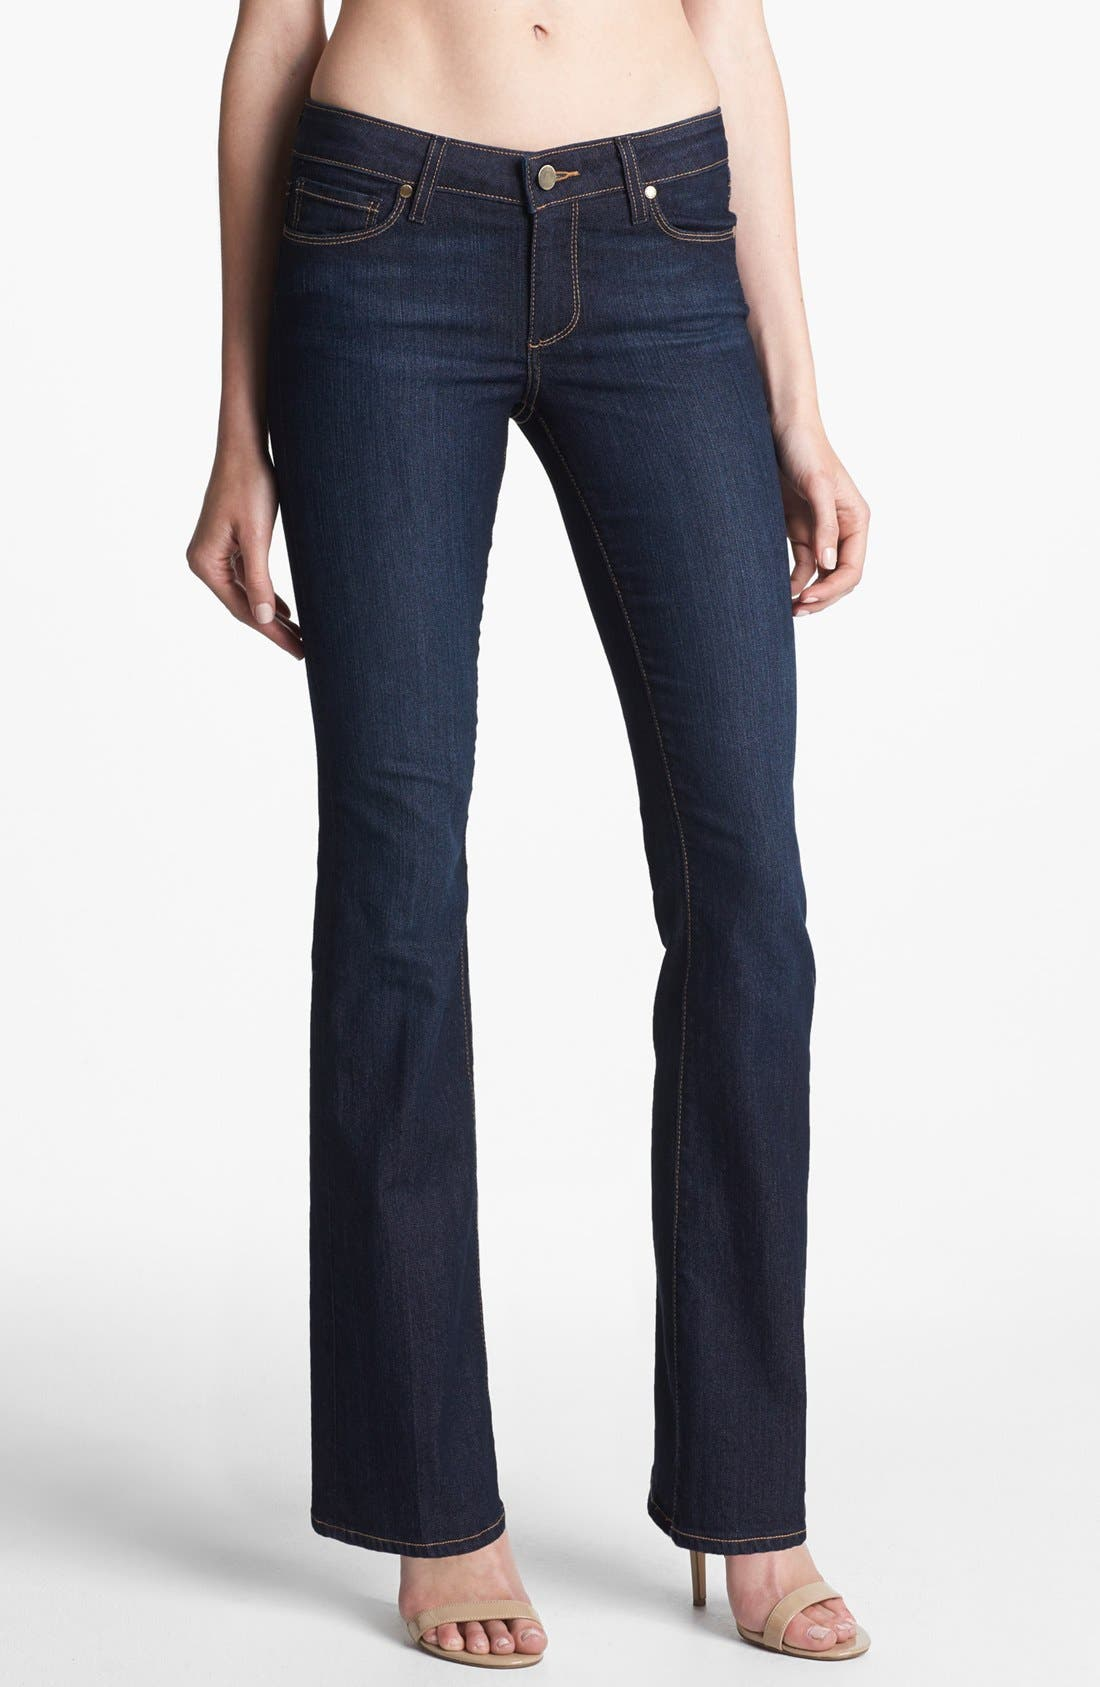 Alternate Image 1 Selected - Paige Denim 'Skyline' Bootcut Stretch Jeans (Carson) (Petite)